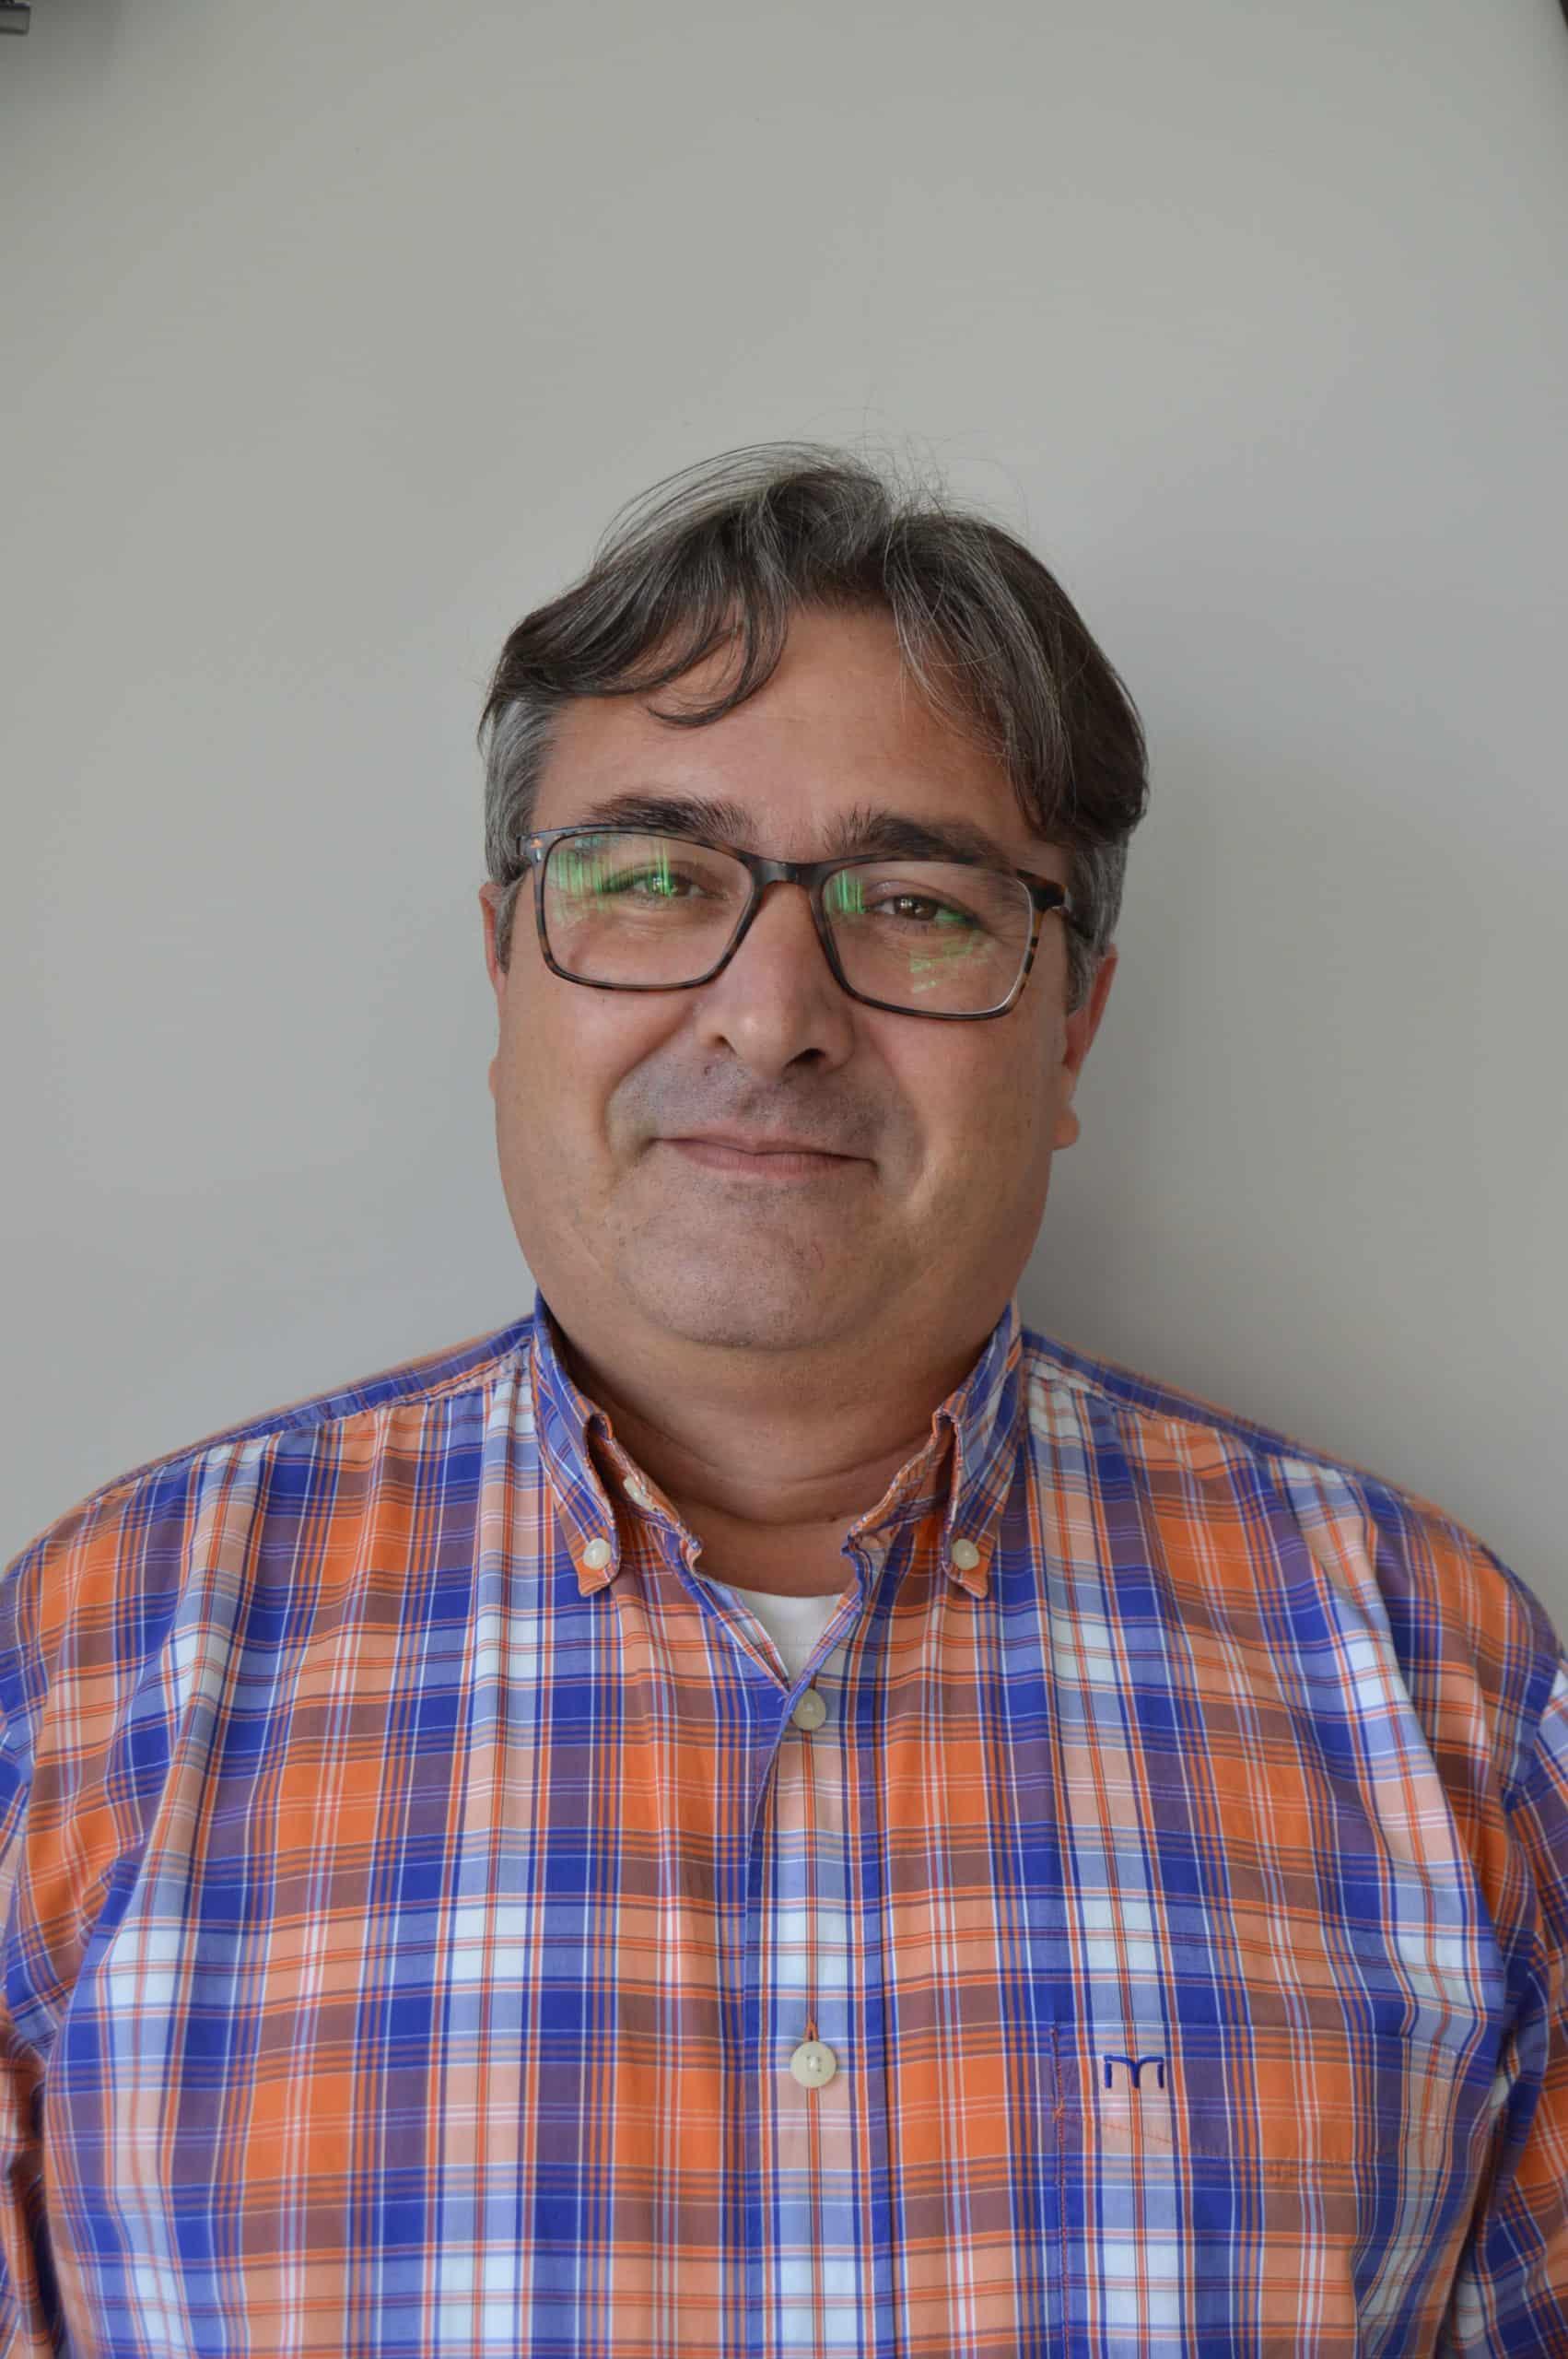 Ignacio Javier Pinilla Sandín